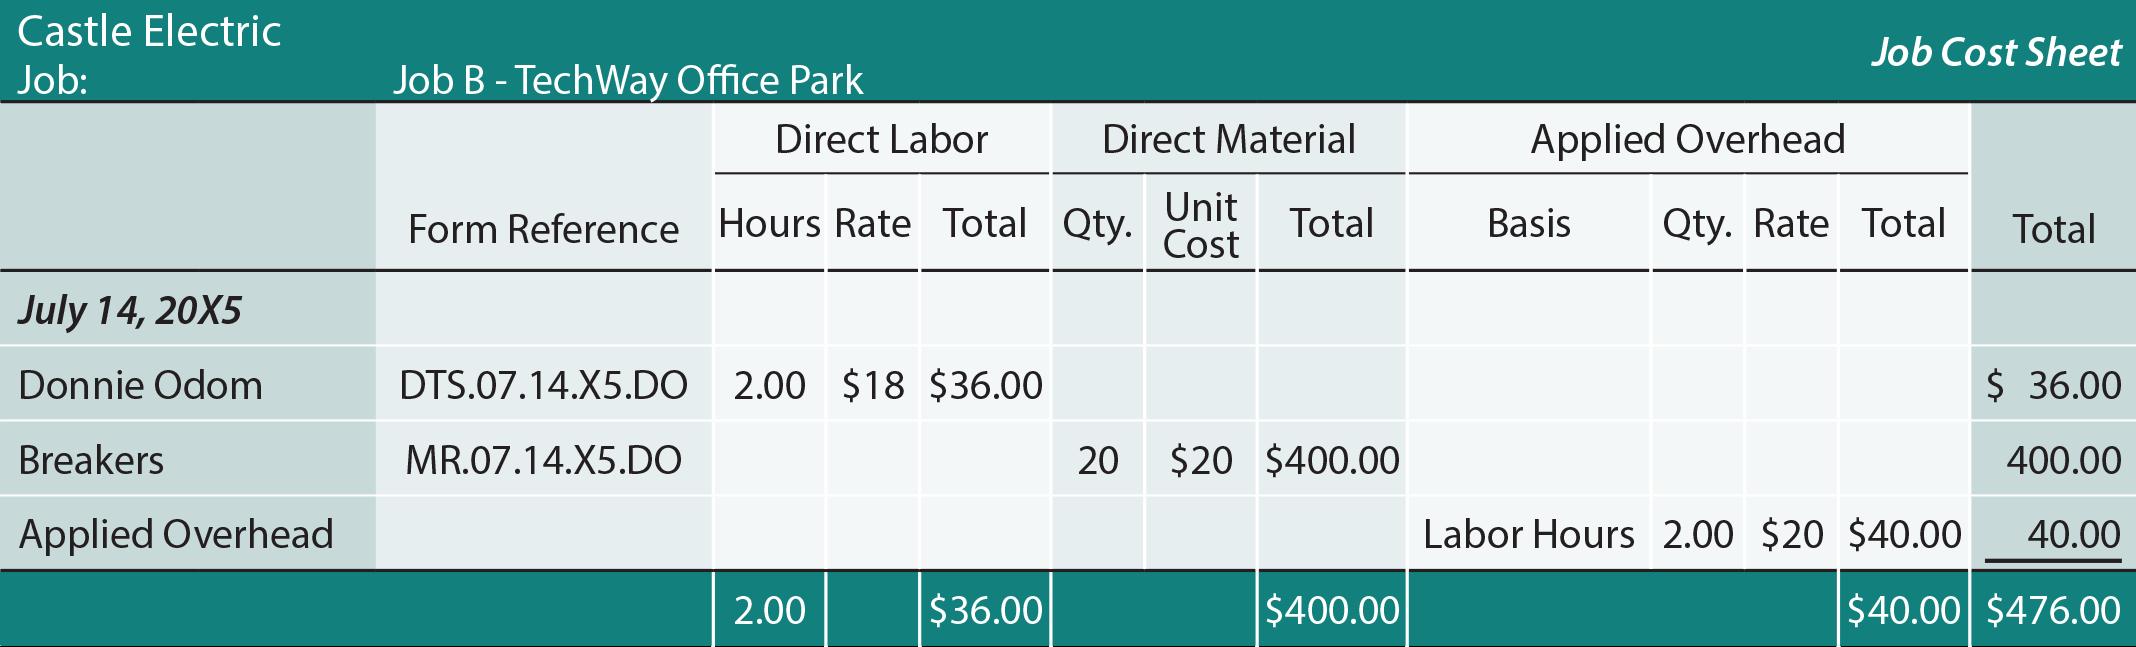 Job Costing Sheet - Job B